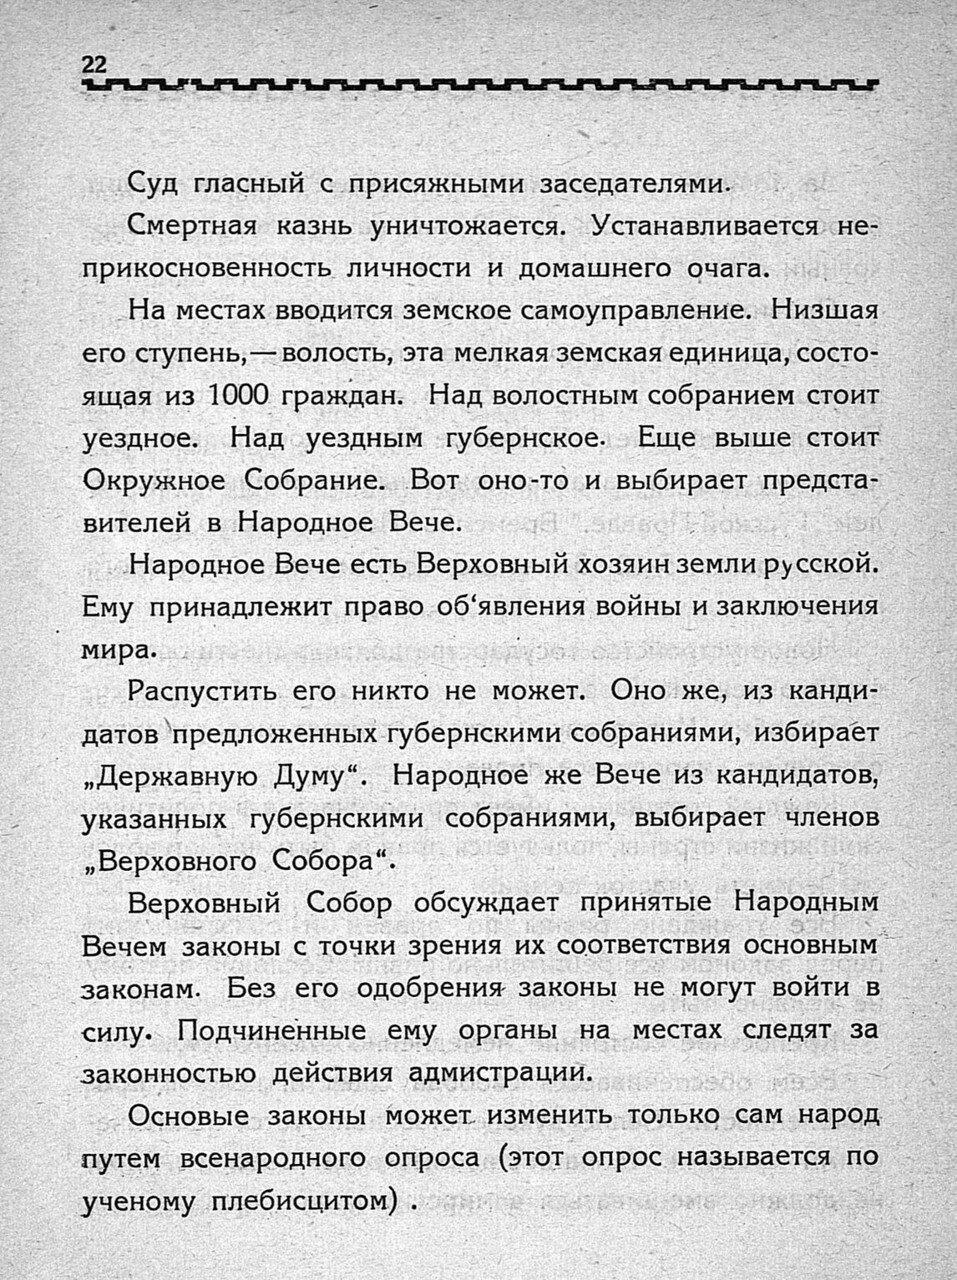 https://img-fotki.yandex.ru/get/51236/199368979.23/0_1bfada_d9835b9d_XXXL.jpg